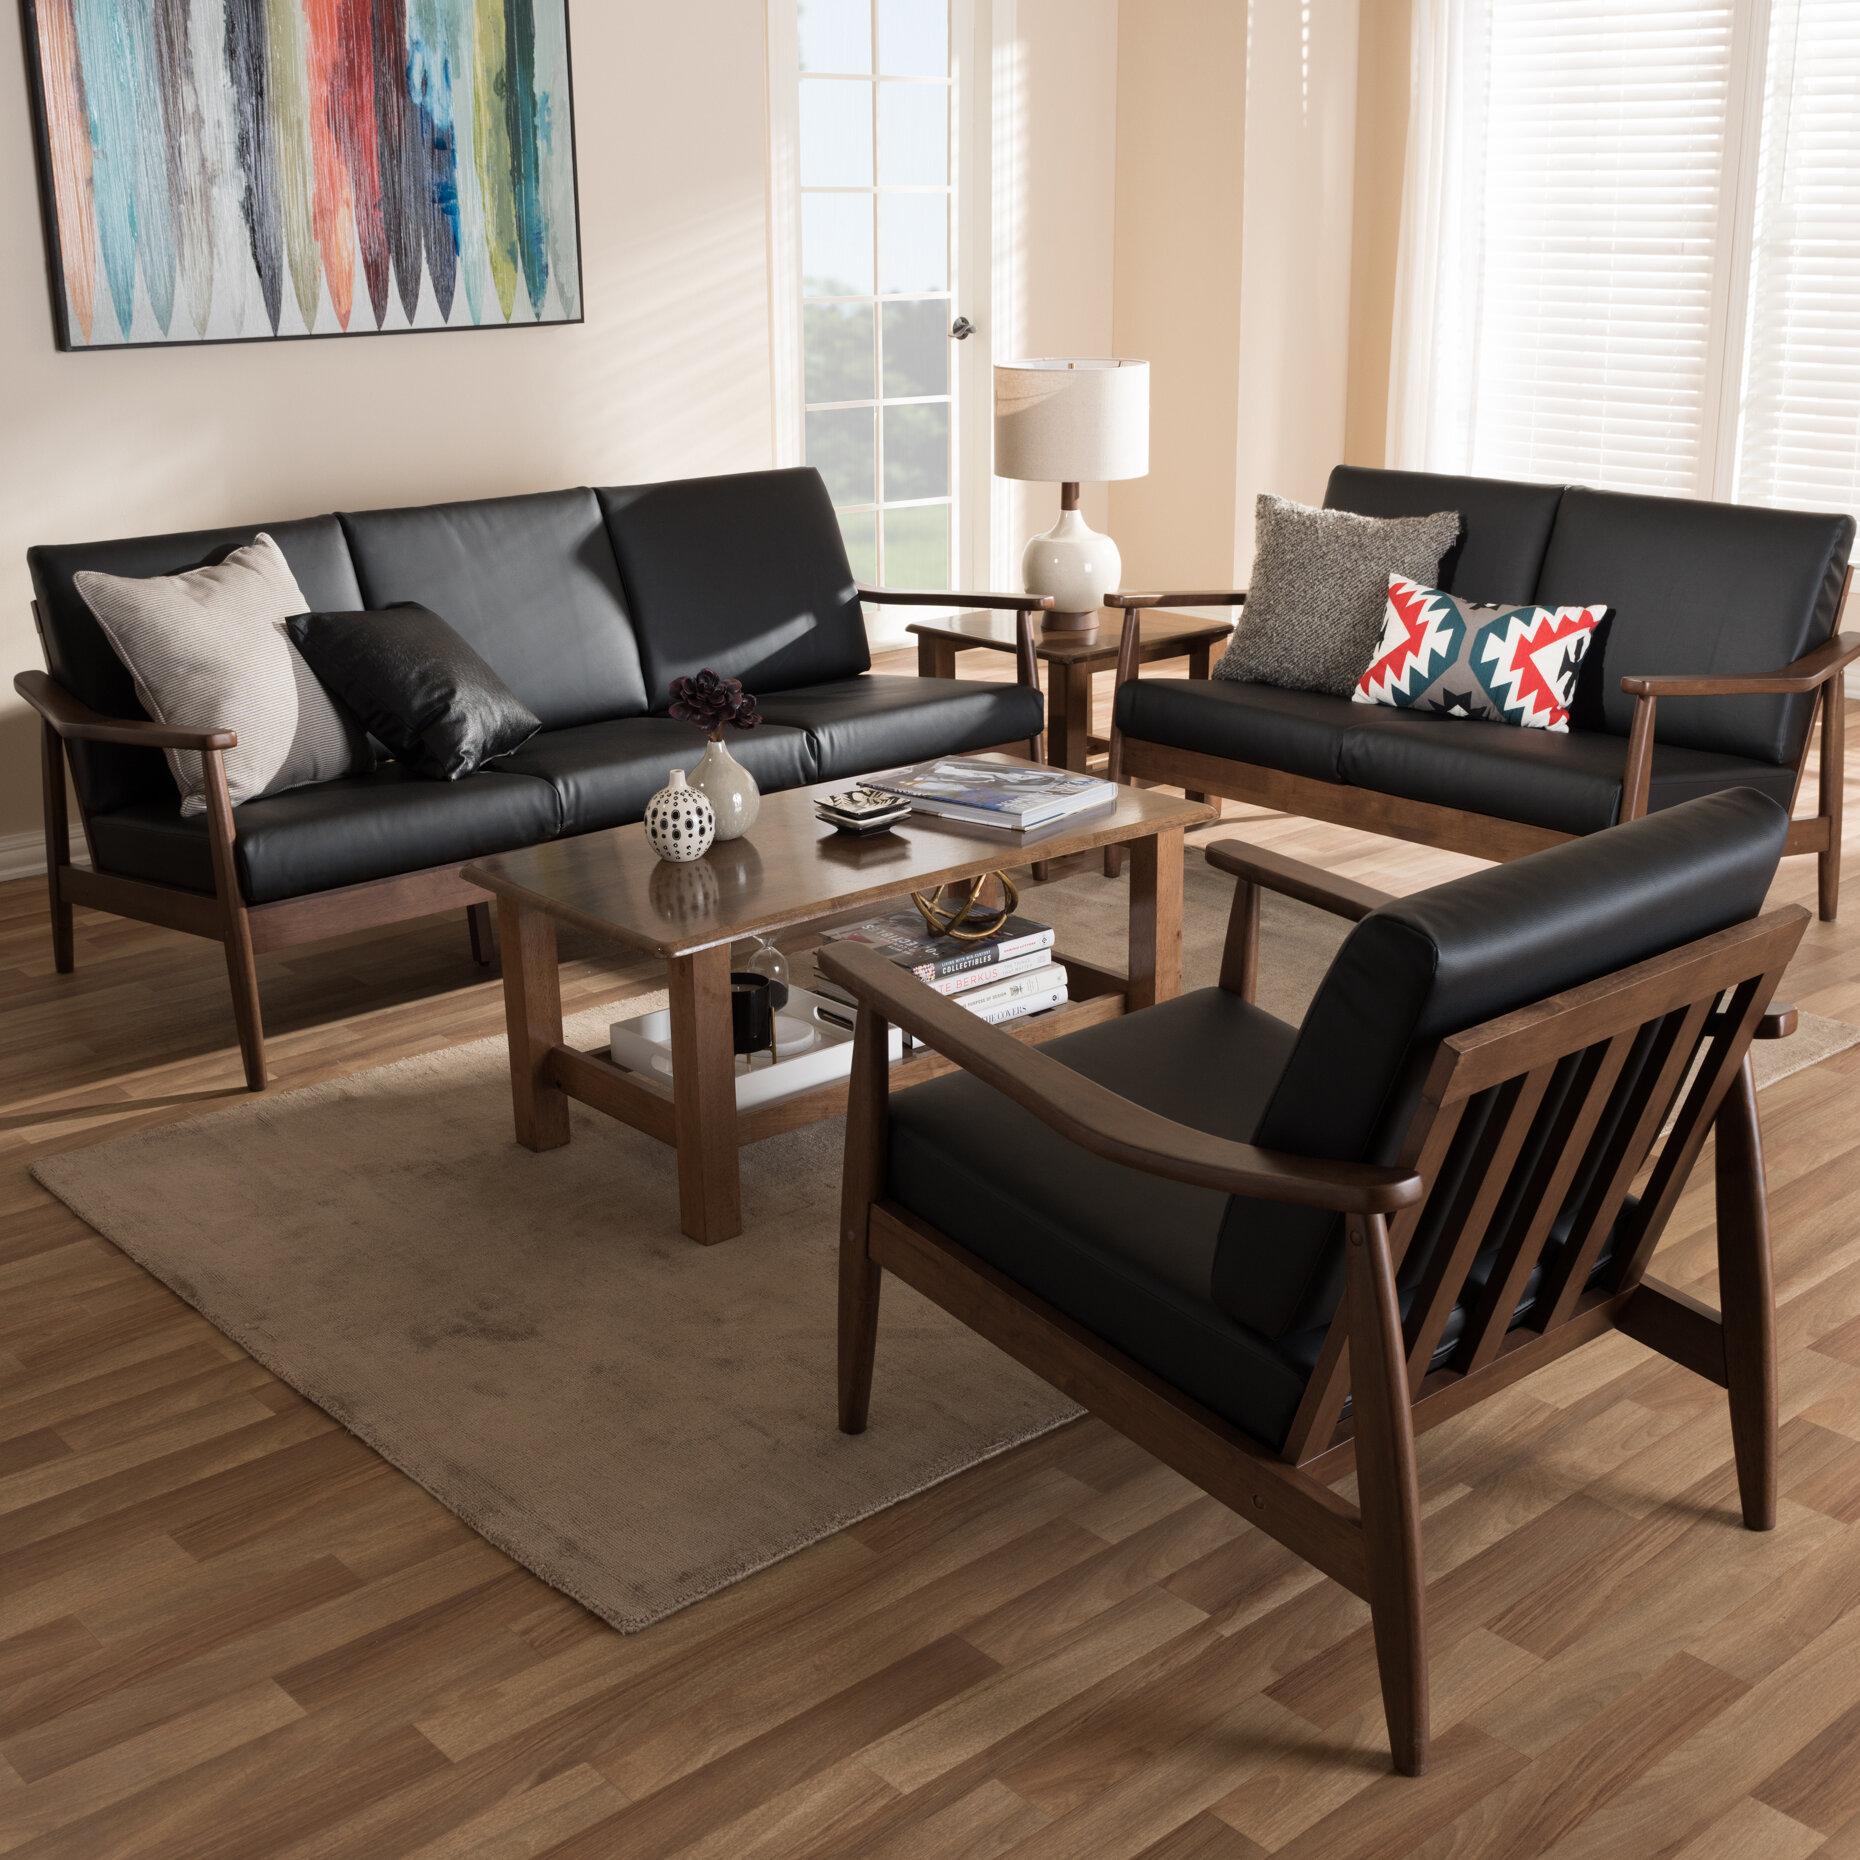 Millwood pines leaman mid century modern 3 piece wood frame living room set wayfair